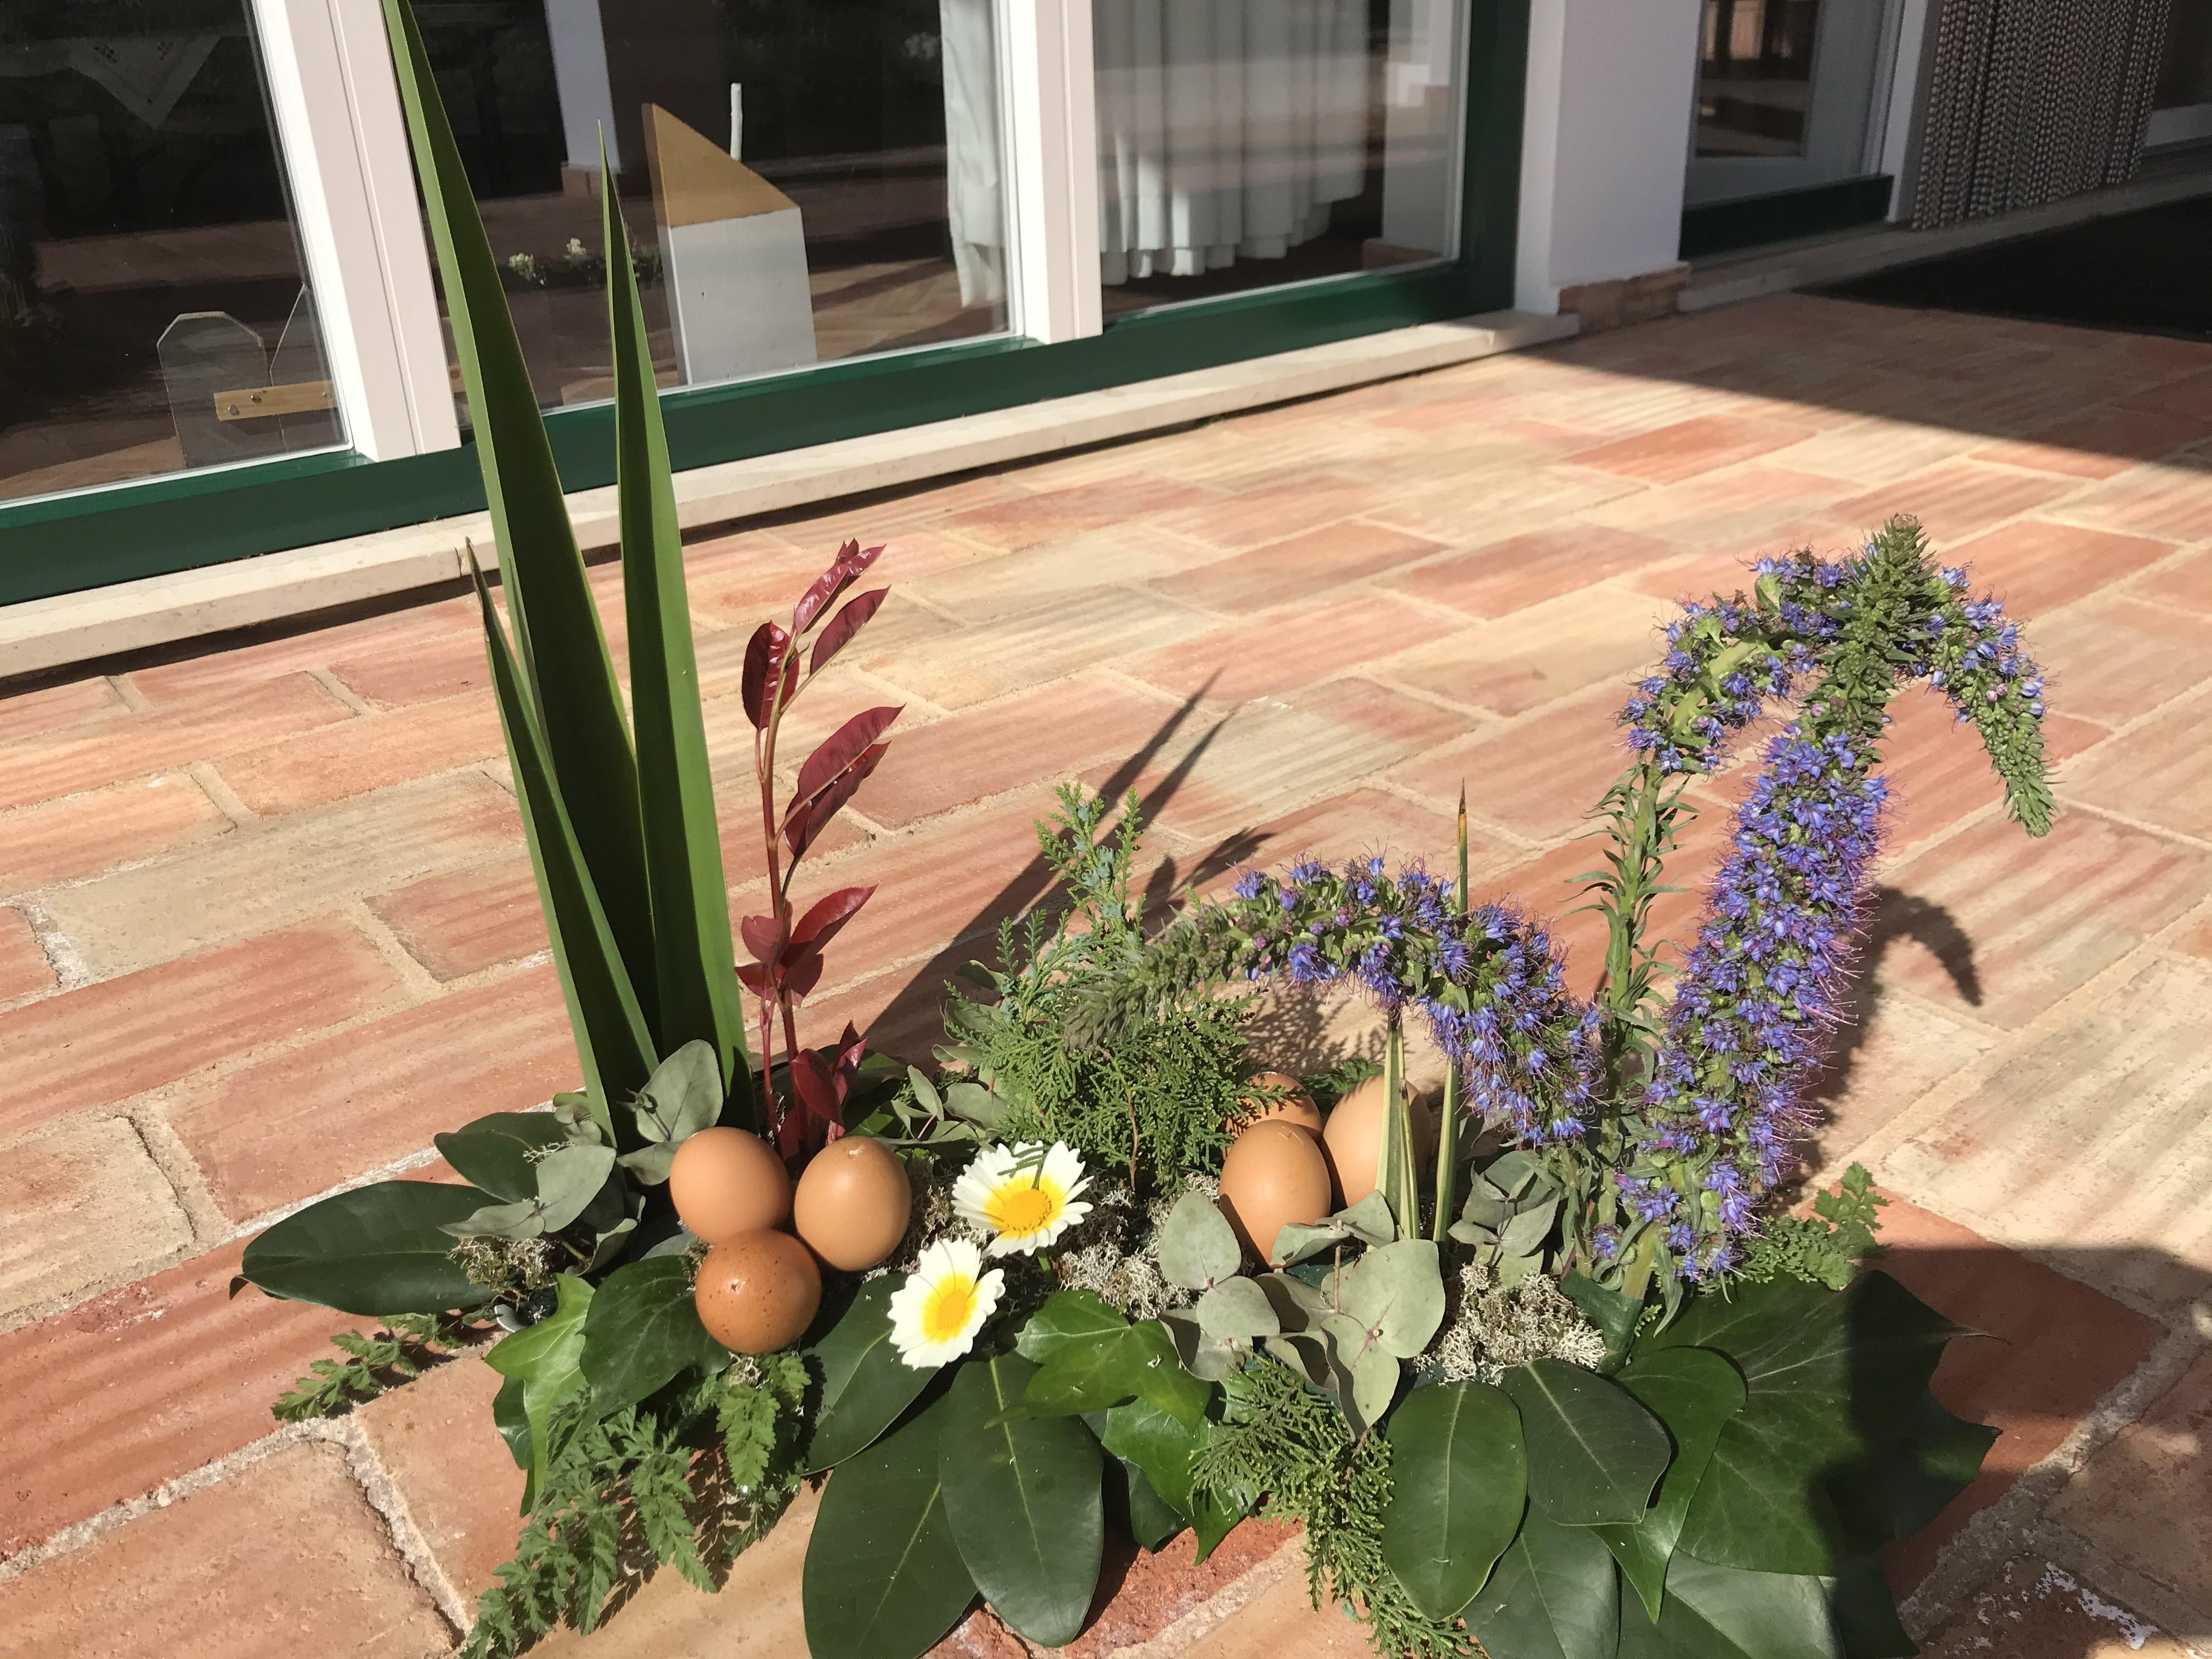 VO-013 | Tuintje - in oasis table deco   Joke's bloemschikken